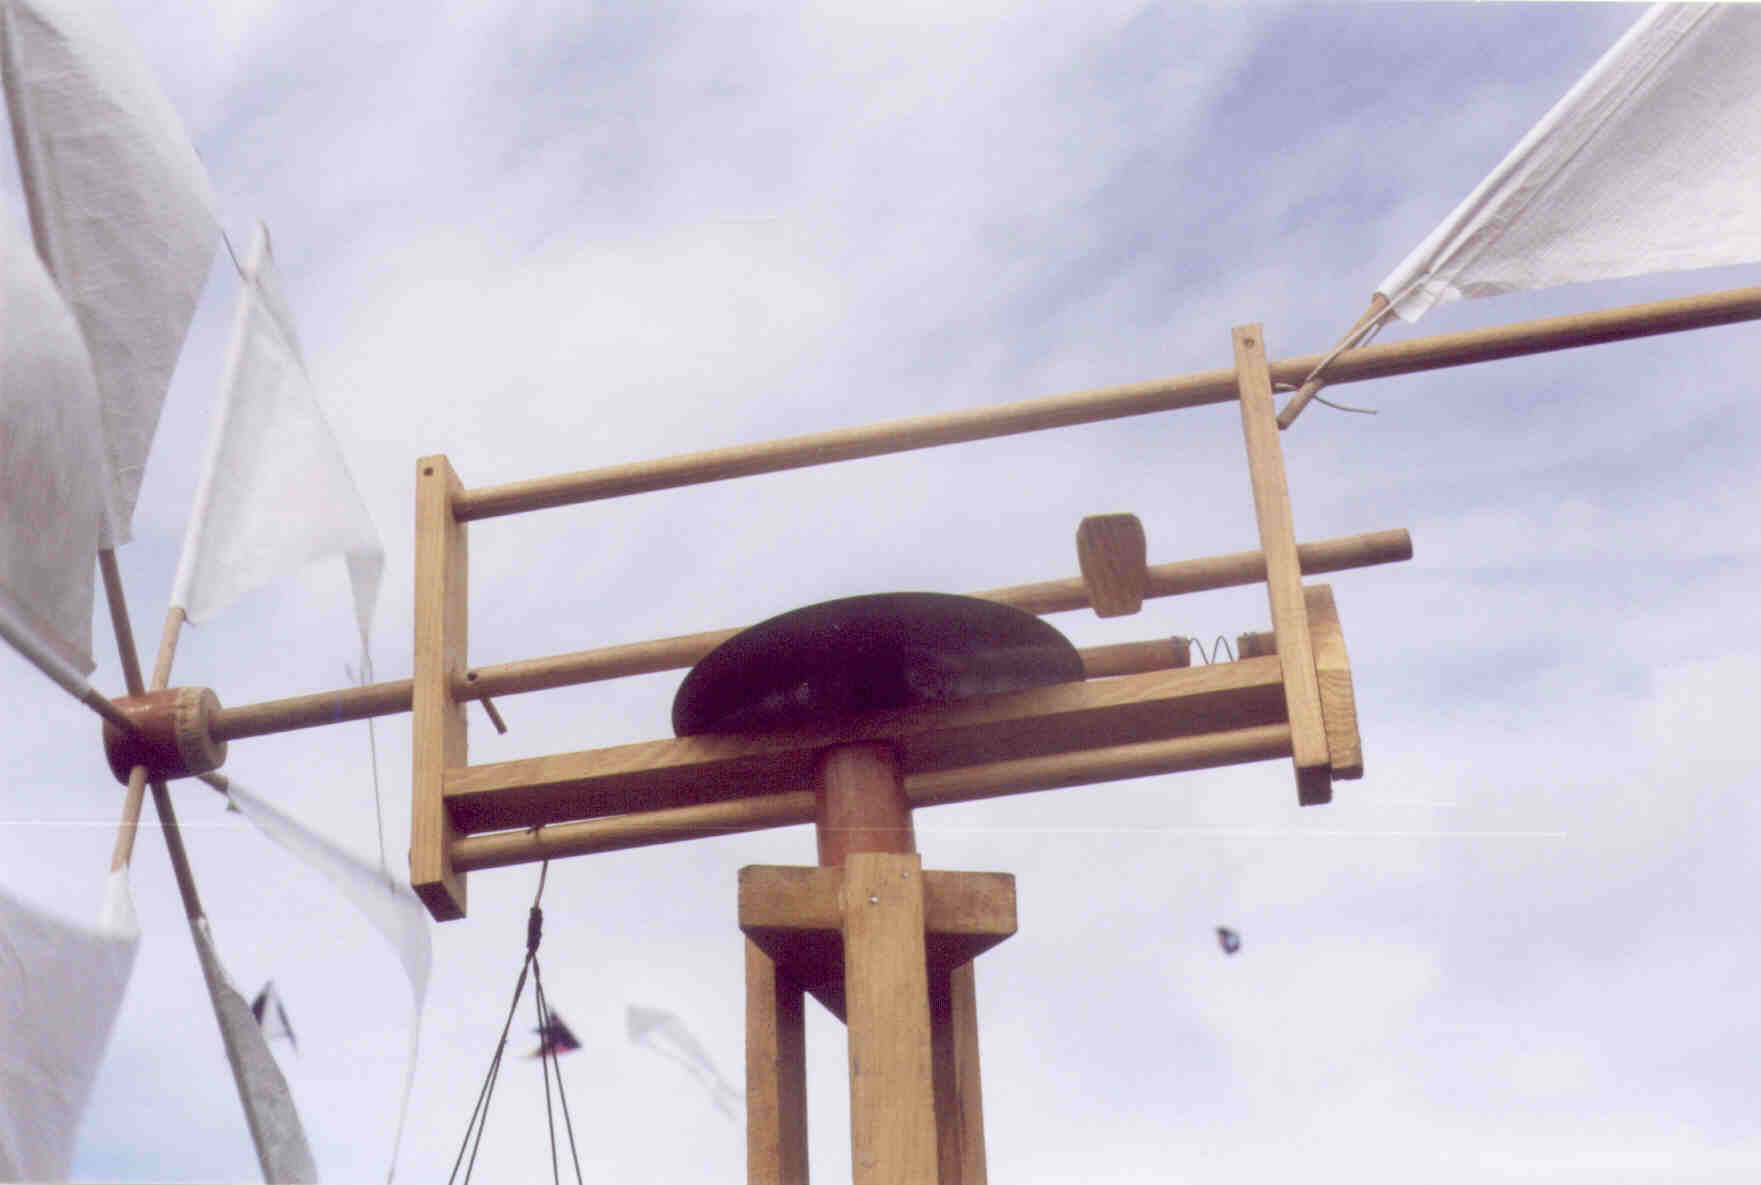 Pr sentation des moulins for Moulin en bois pour jardin